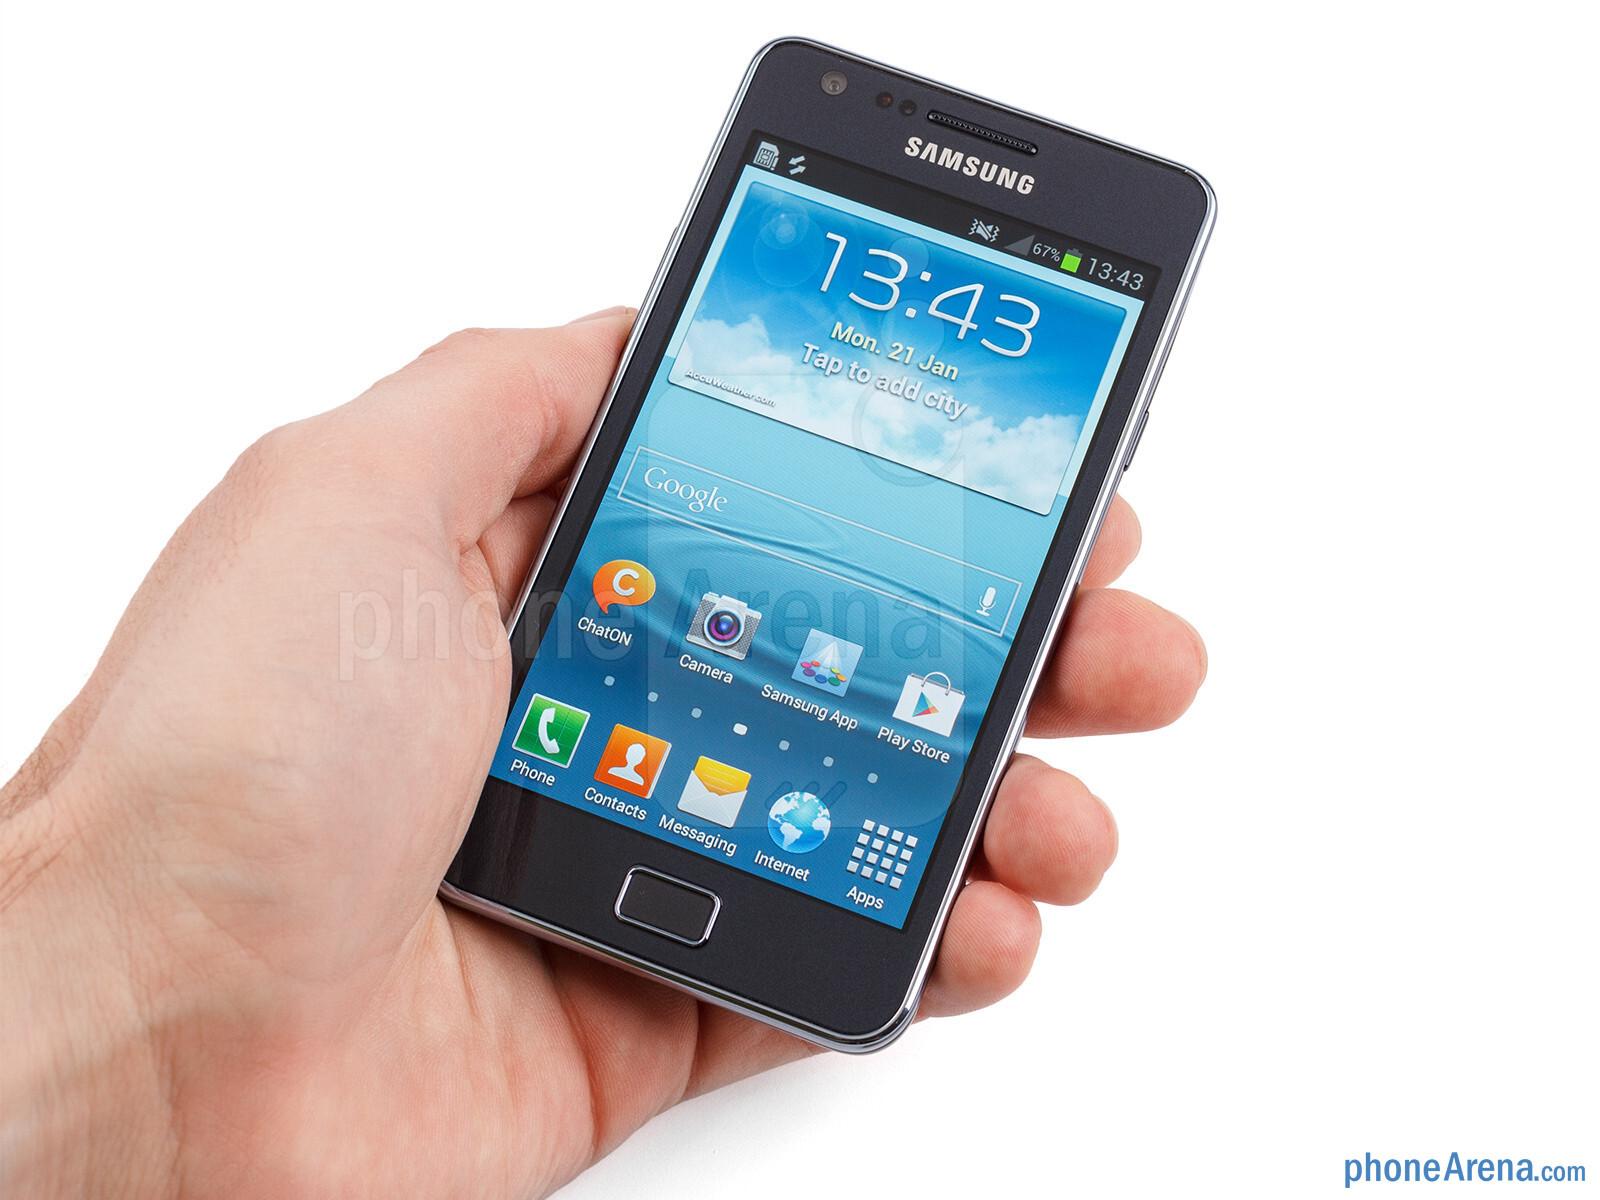 Galaxy s Plus Wallpaper The Samsung Galaxy s ii Plus